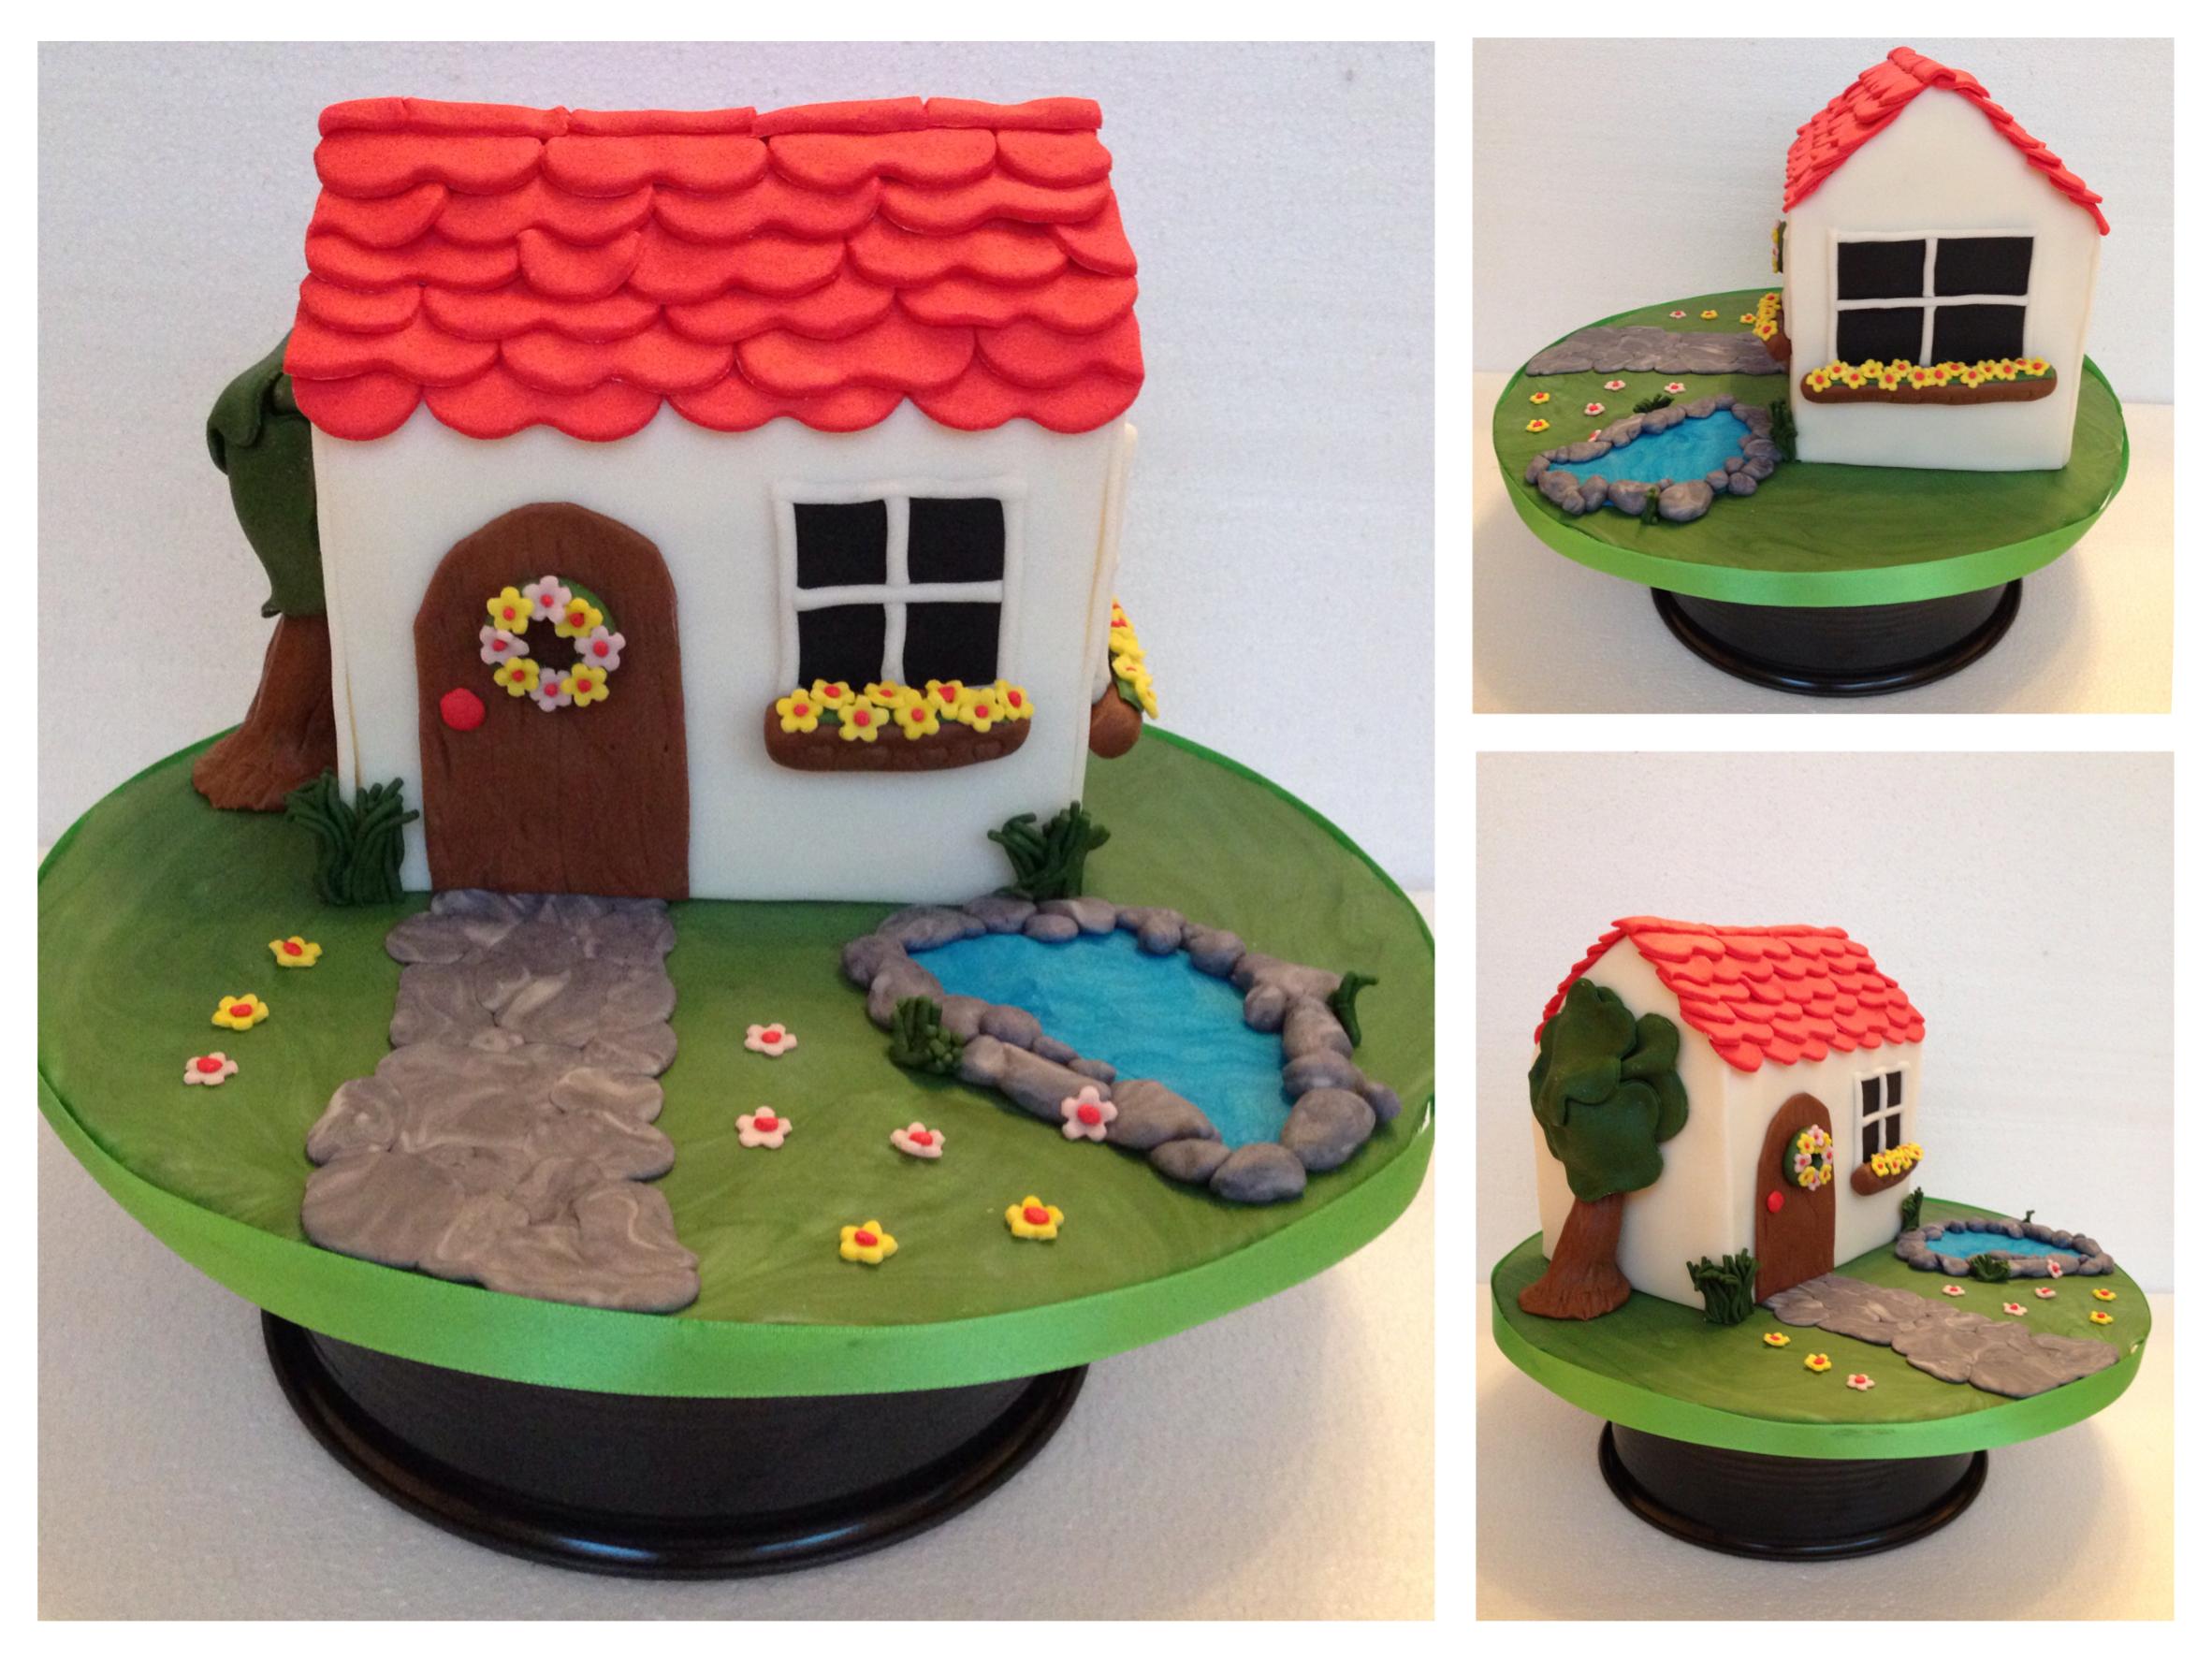 3d Kuchen: Haus, Balkonkästen, Teich Aus Fondant